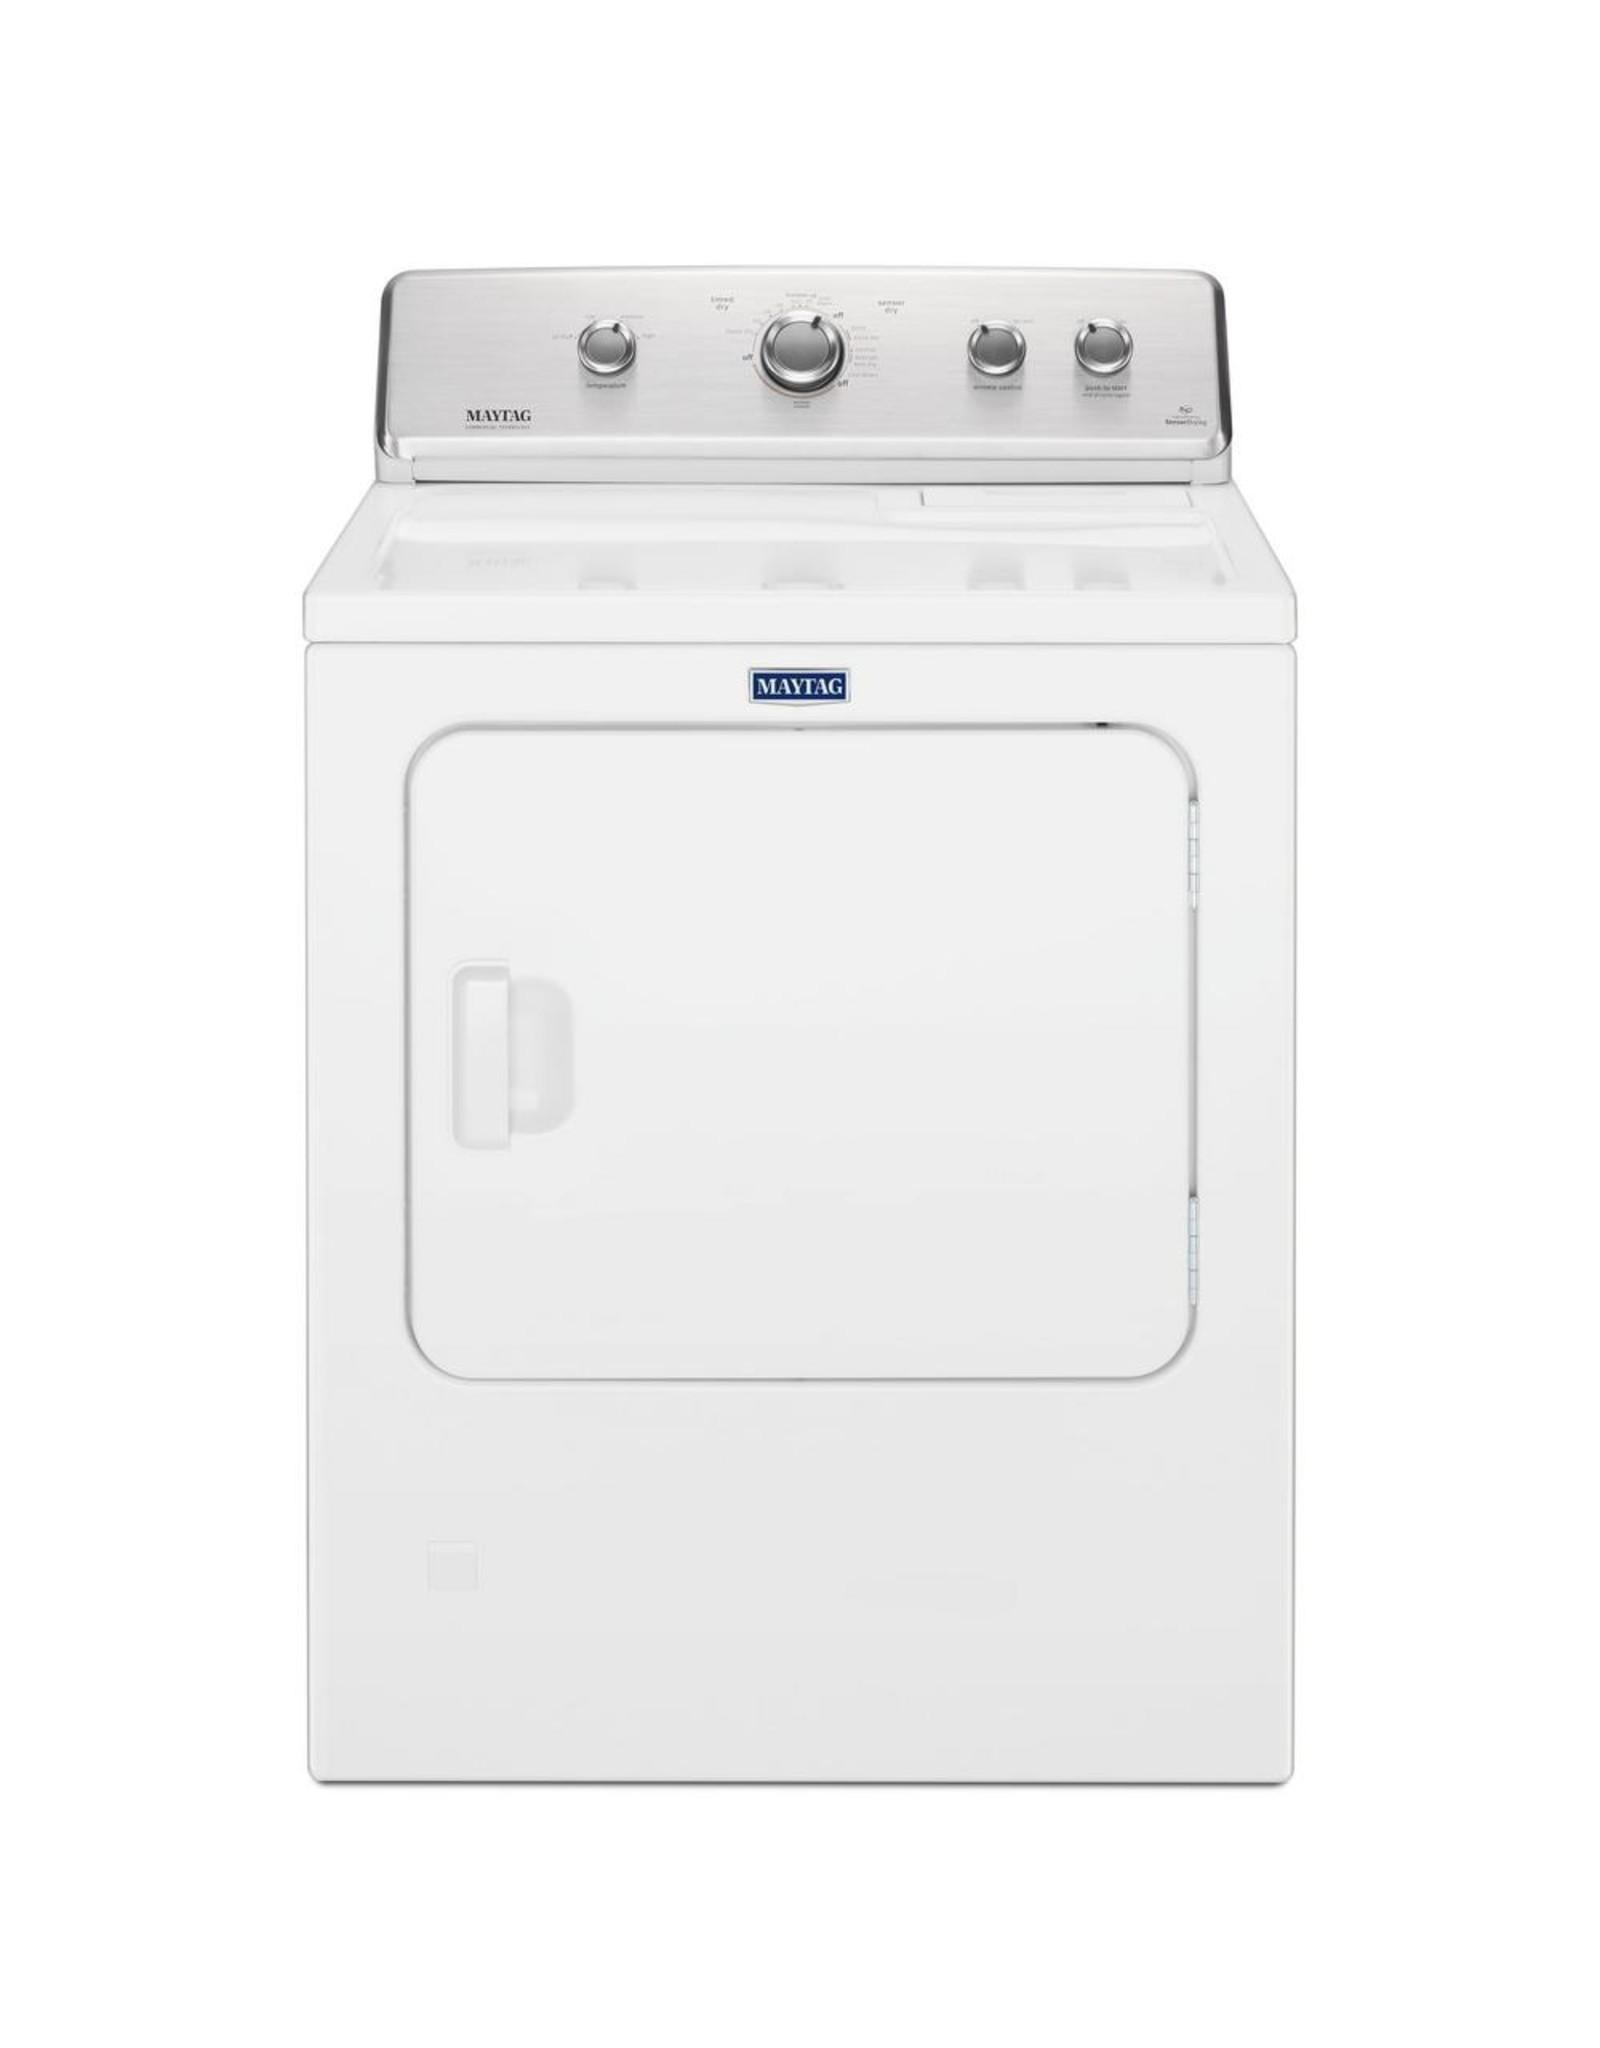 MAYTAG MEDC465HW MAY Air Vented - Dryer TL Matching - 29# WOD - ELEC